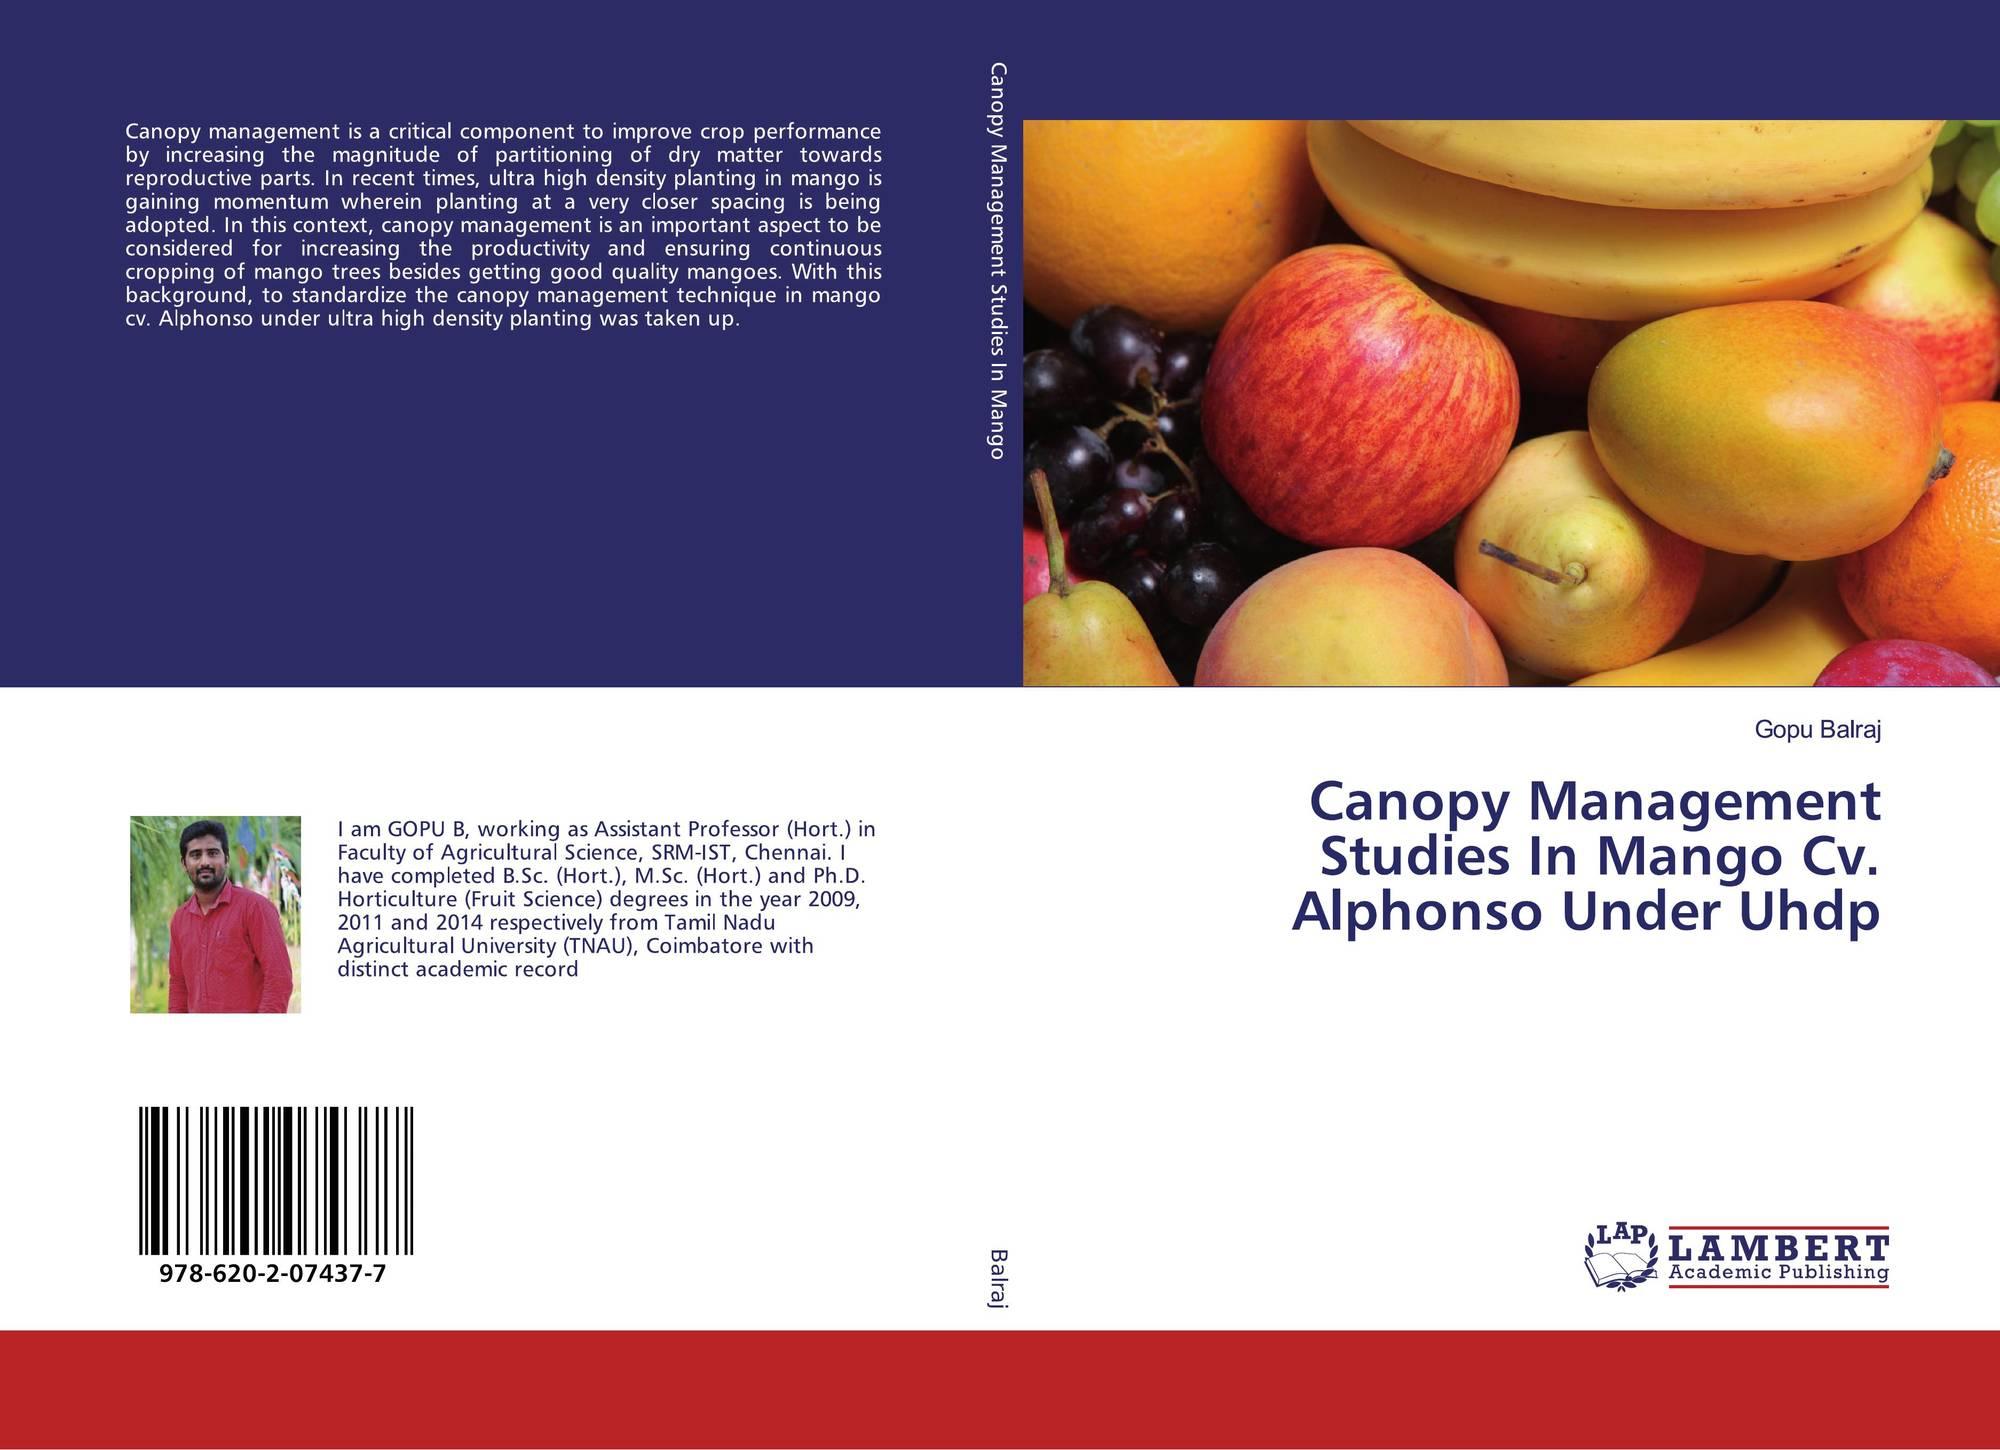 Canopy Management Studies In Mango Cv  Alphonso Under Uhdp